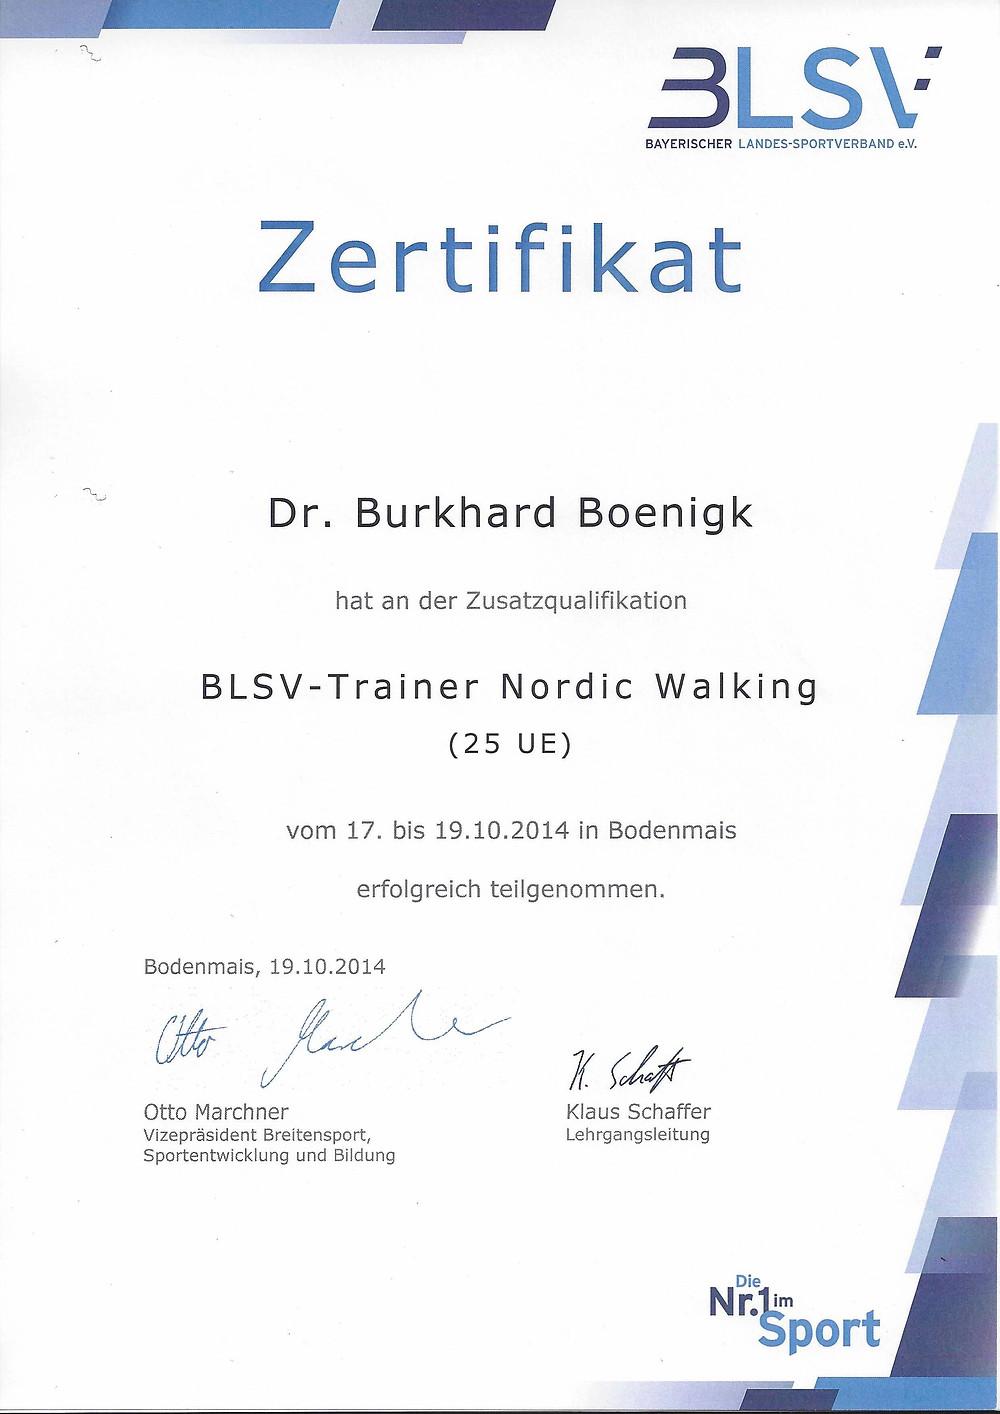 Laufinstinkt Schwaben Augsburg - BLSV-Trainer Nordic Walking